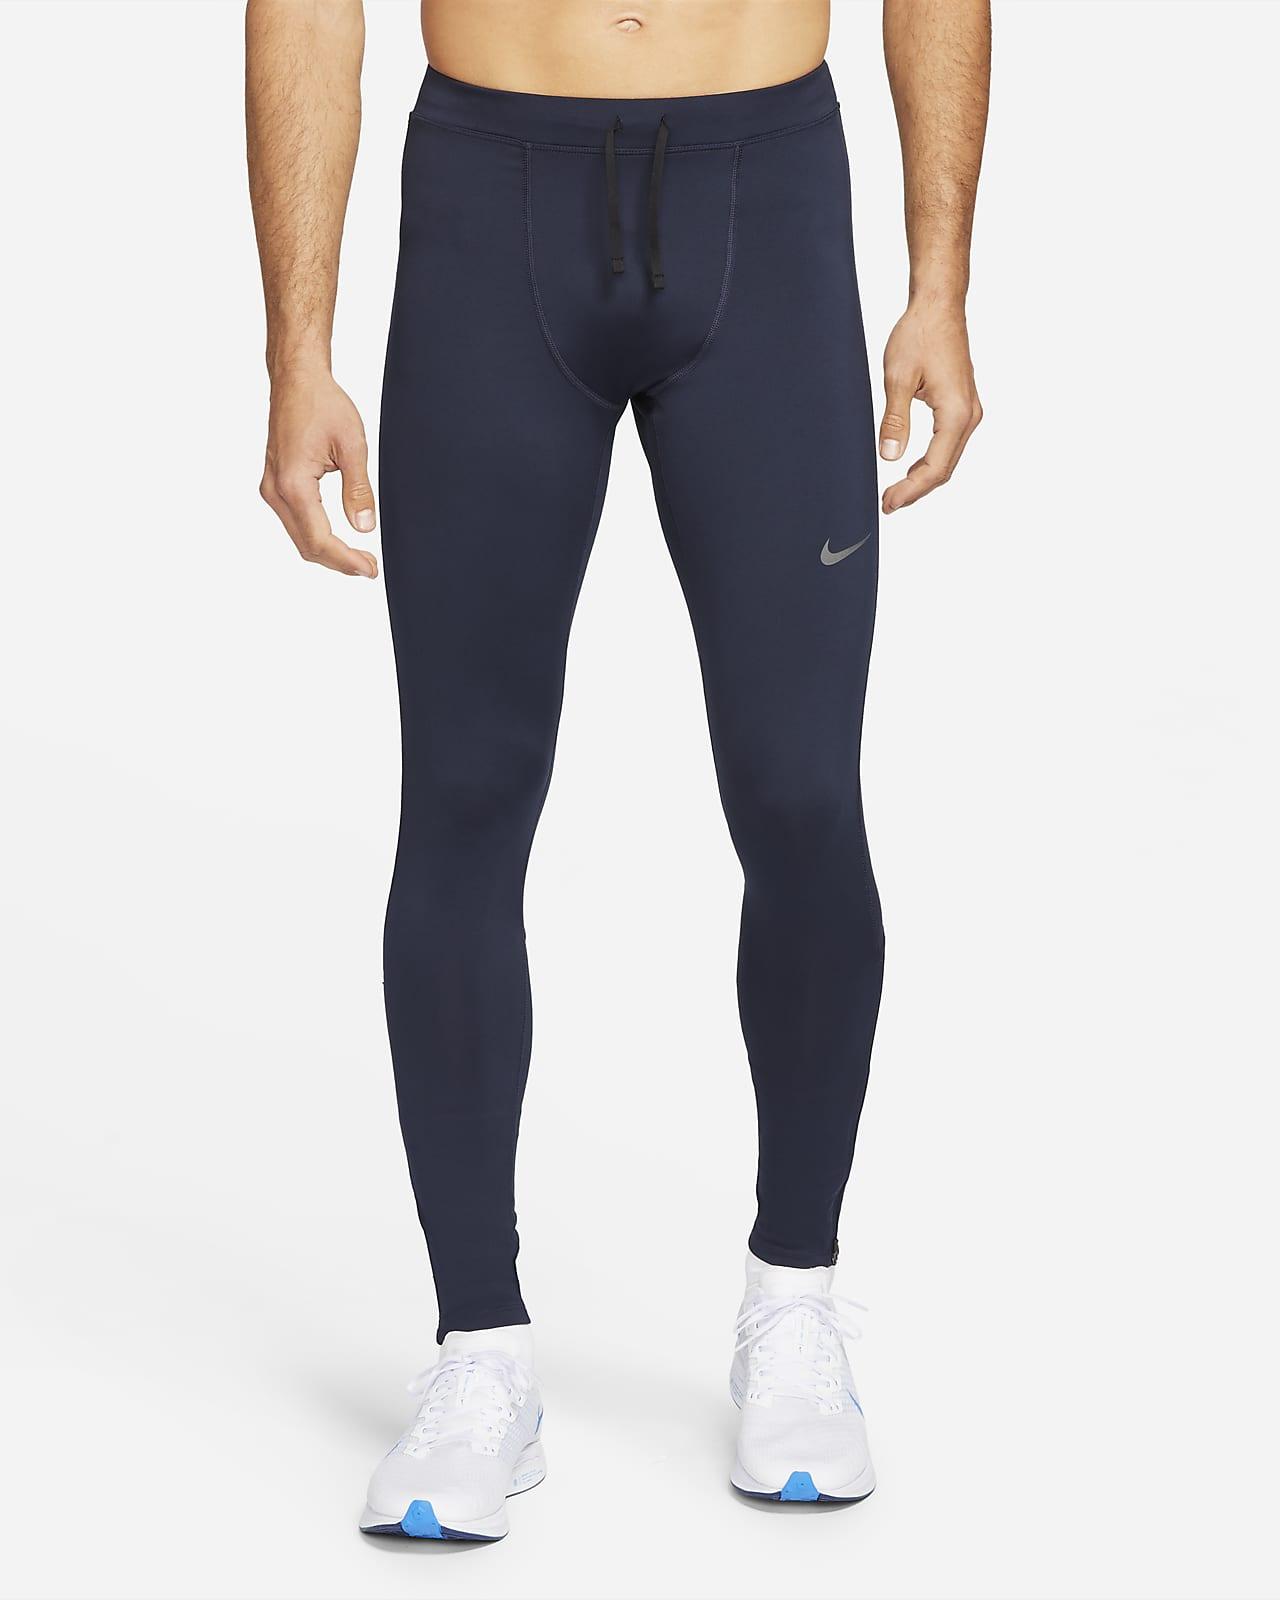 Nike Dri-FIT Challenger Men's Running Tights